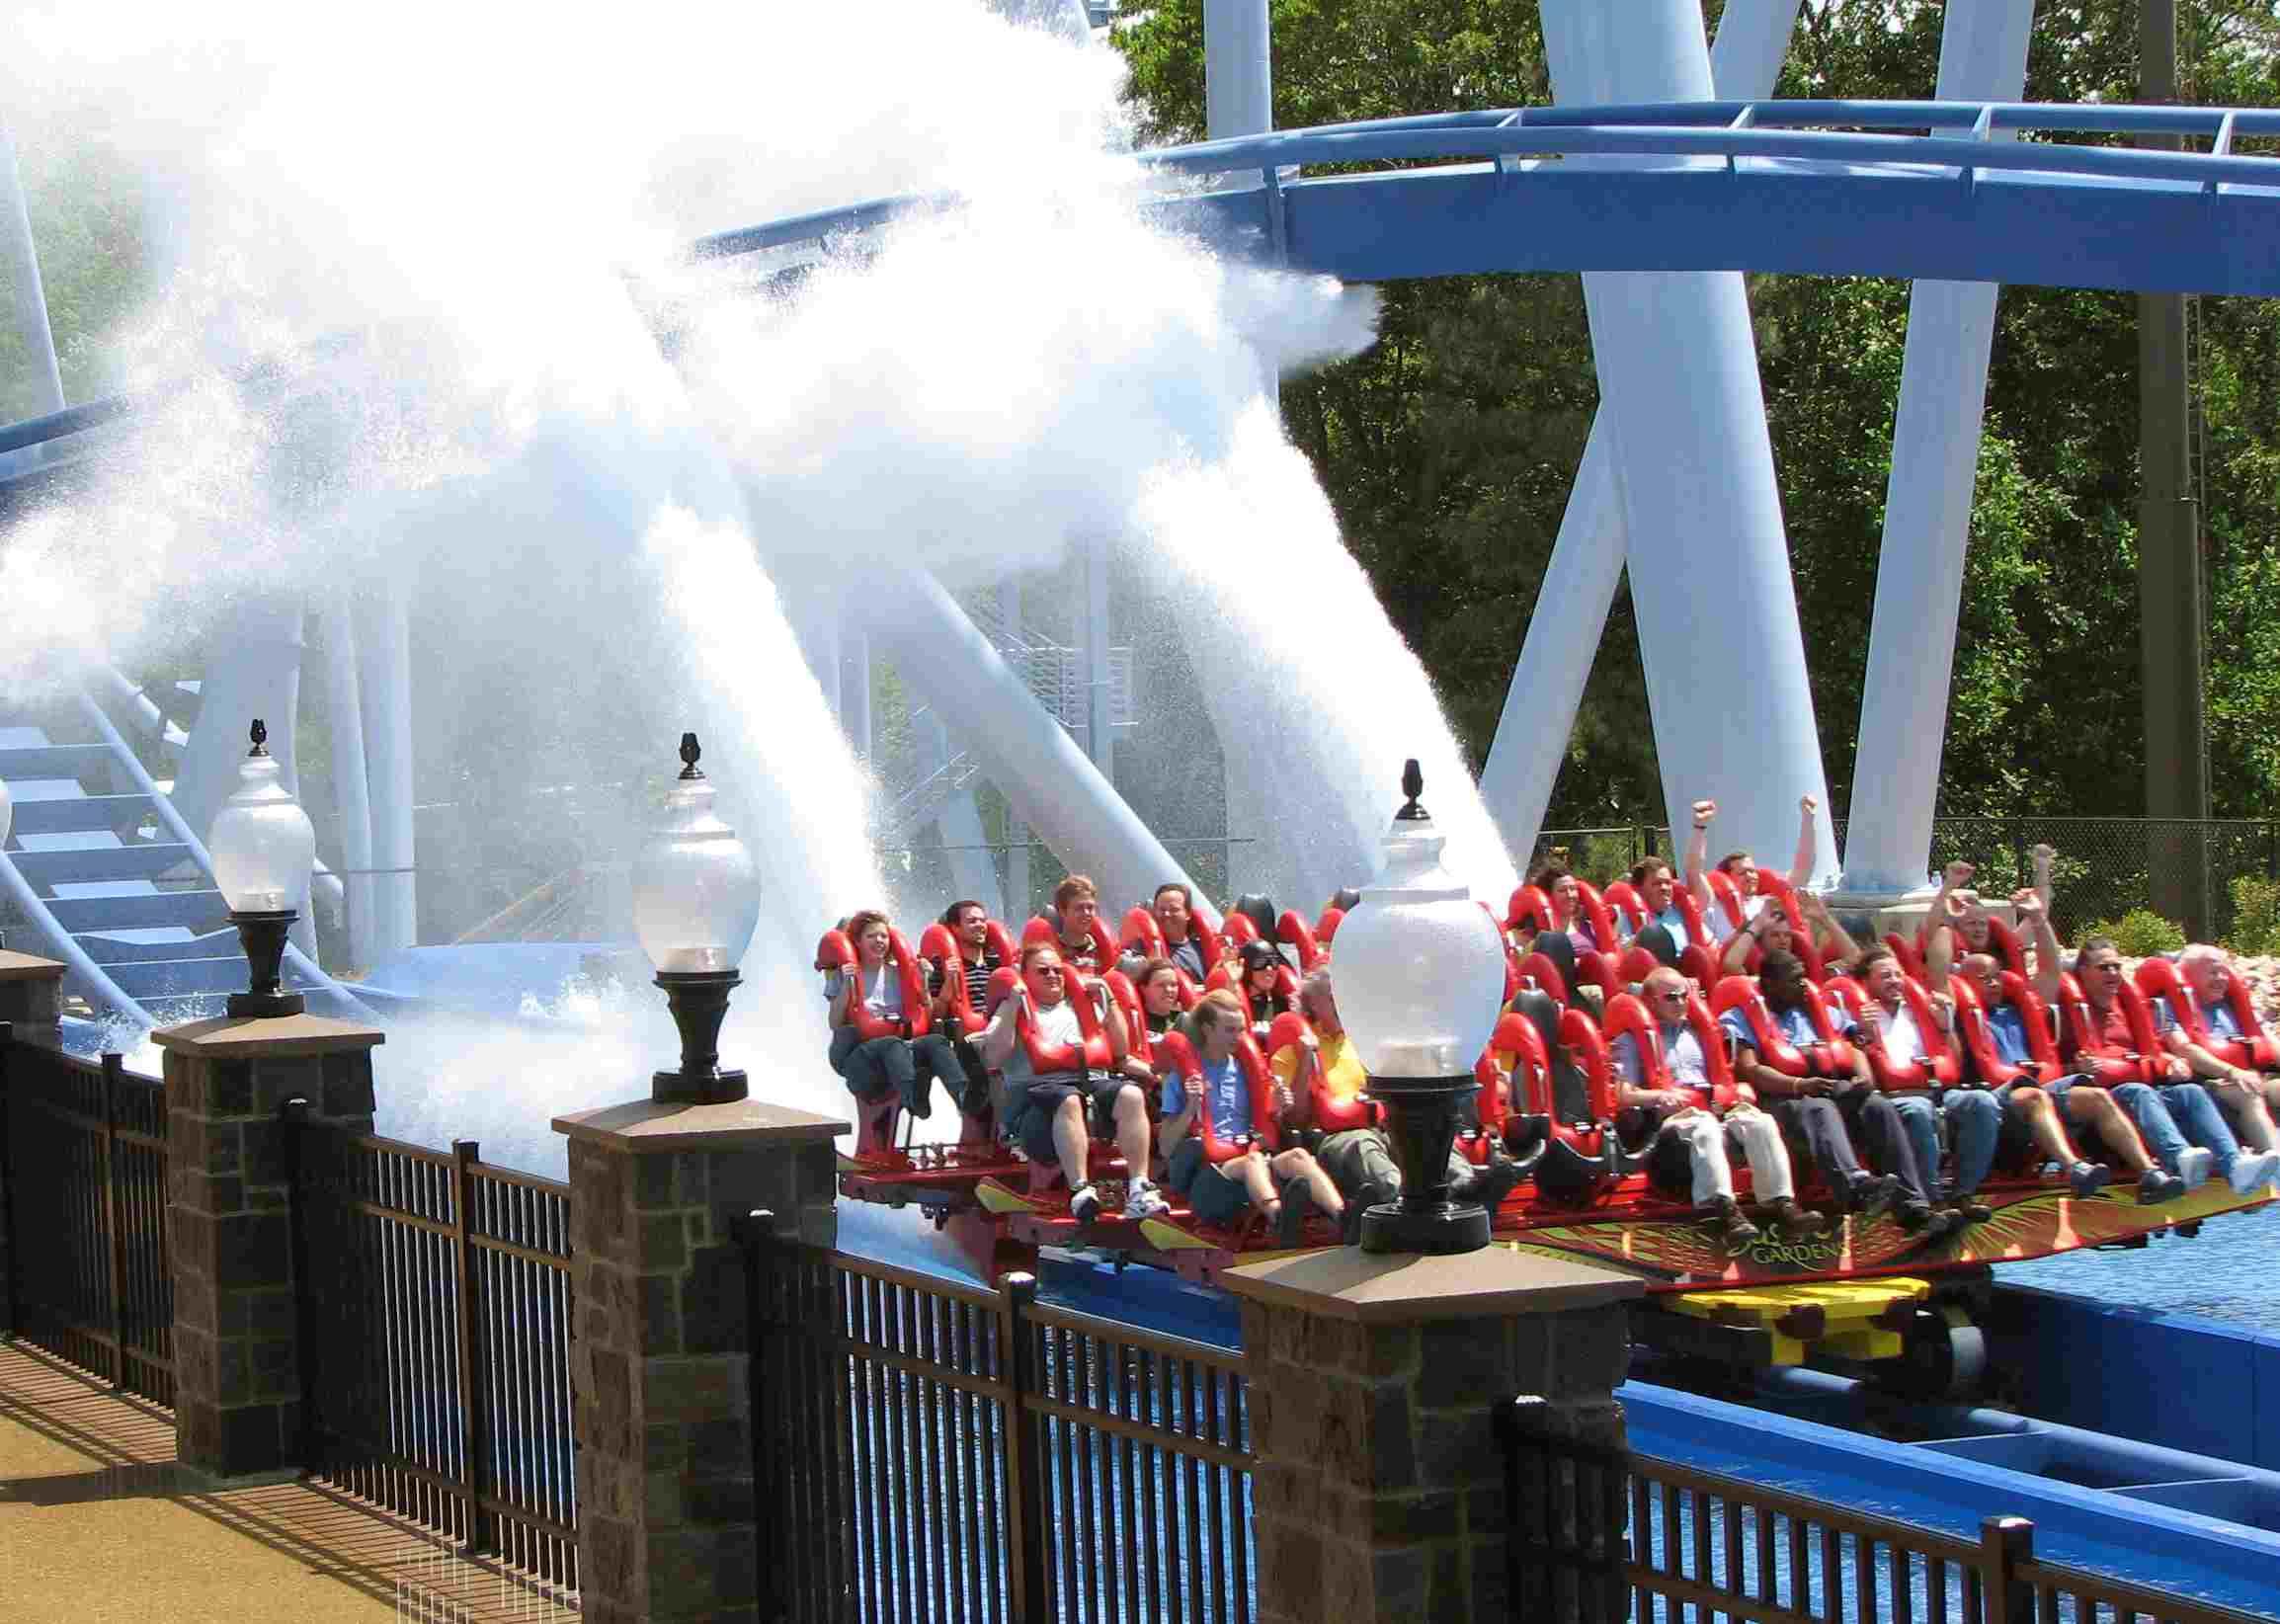 The Griffon at Busch Gardens